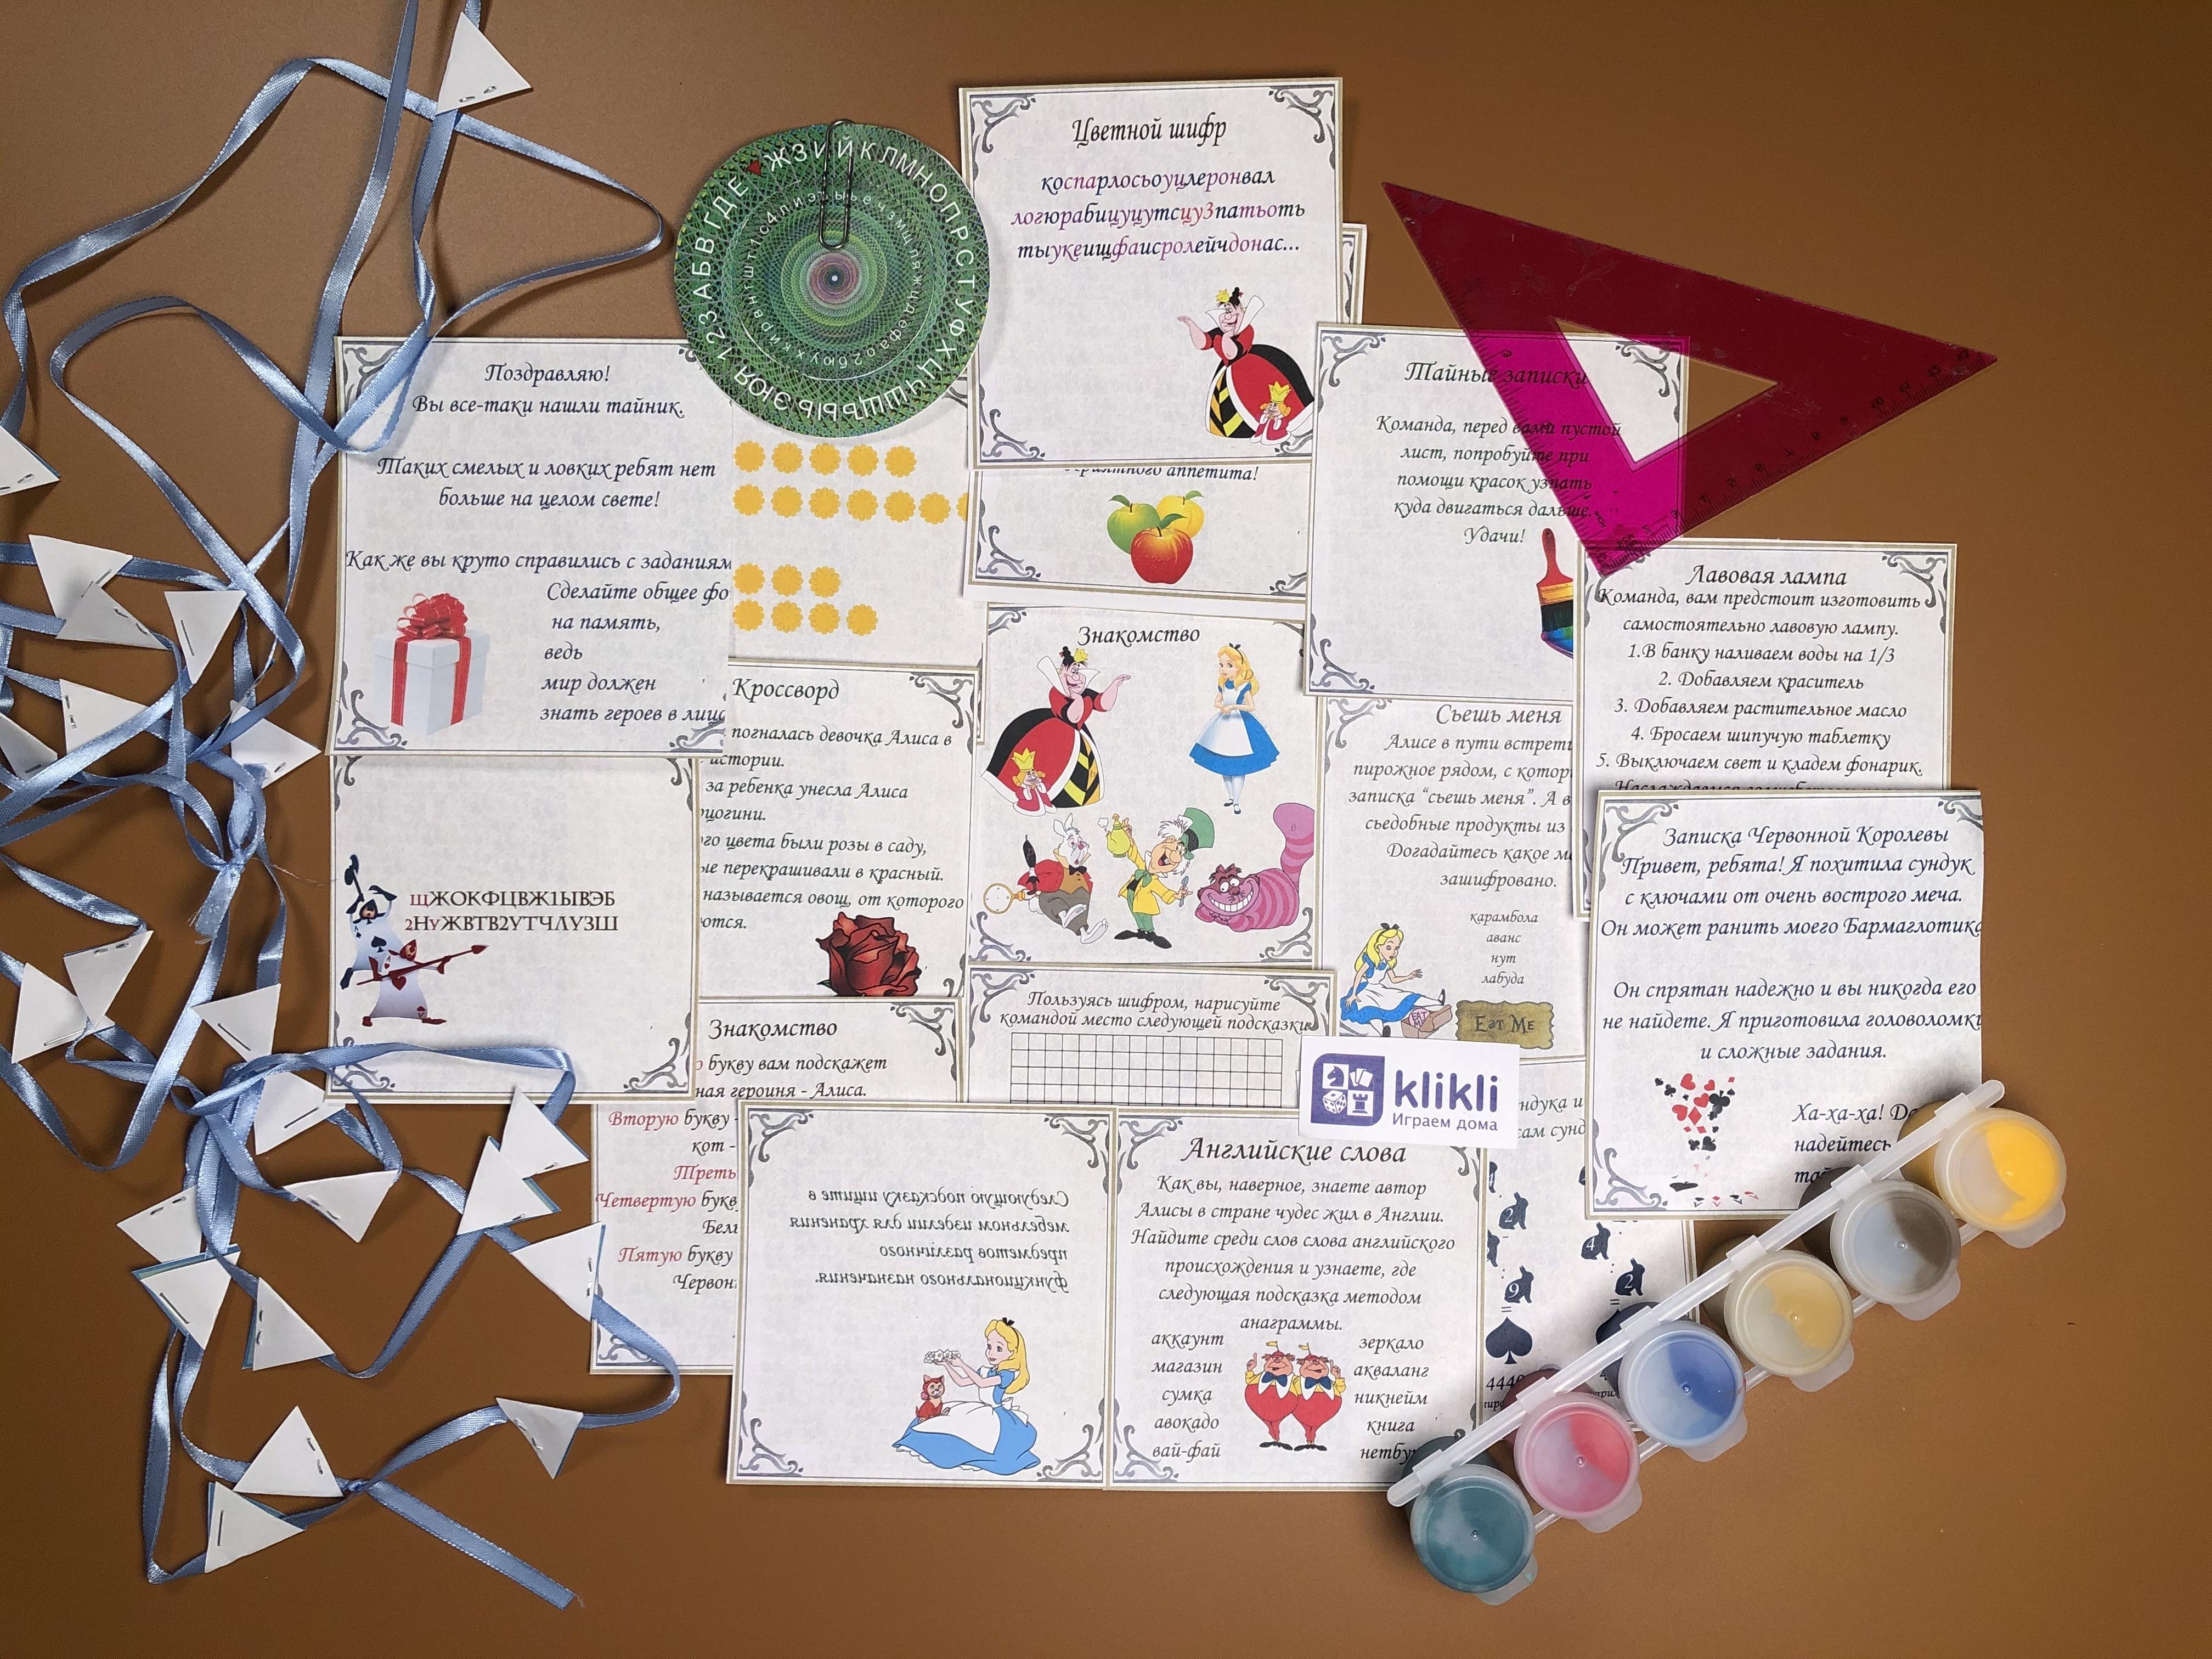 карточки заданий к квесту Алиса в стране чудес